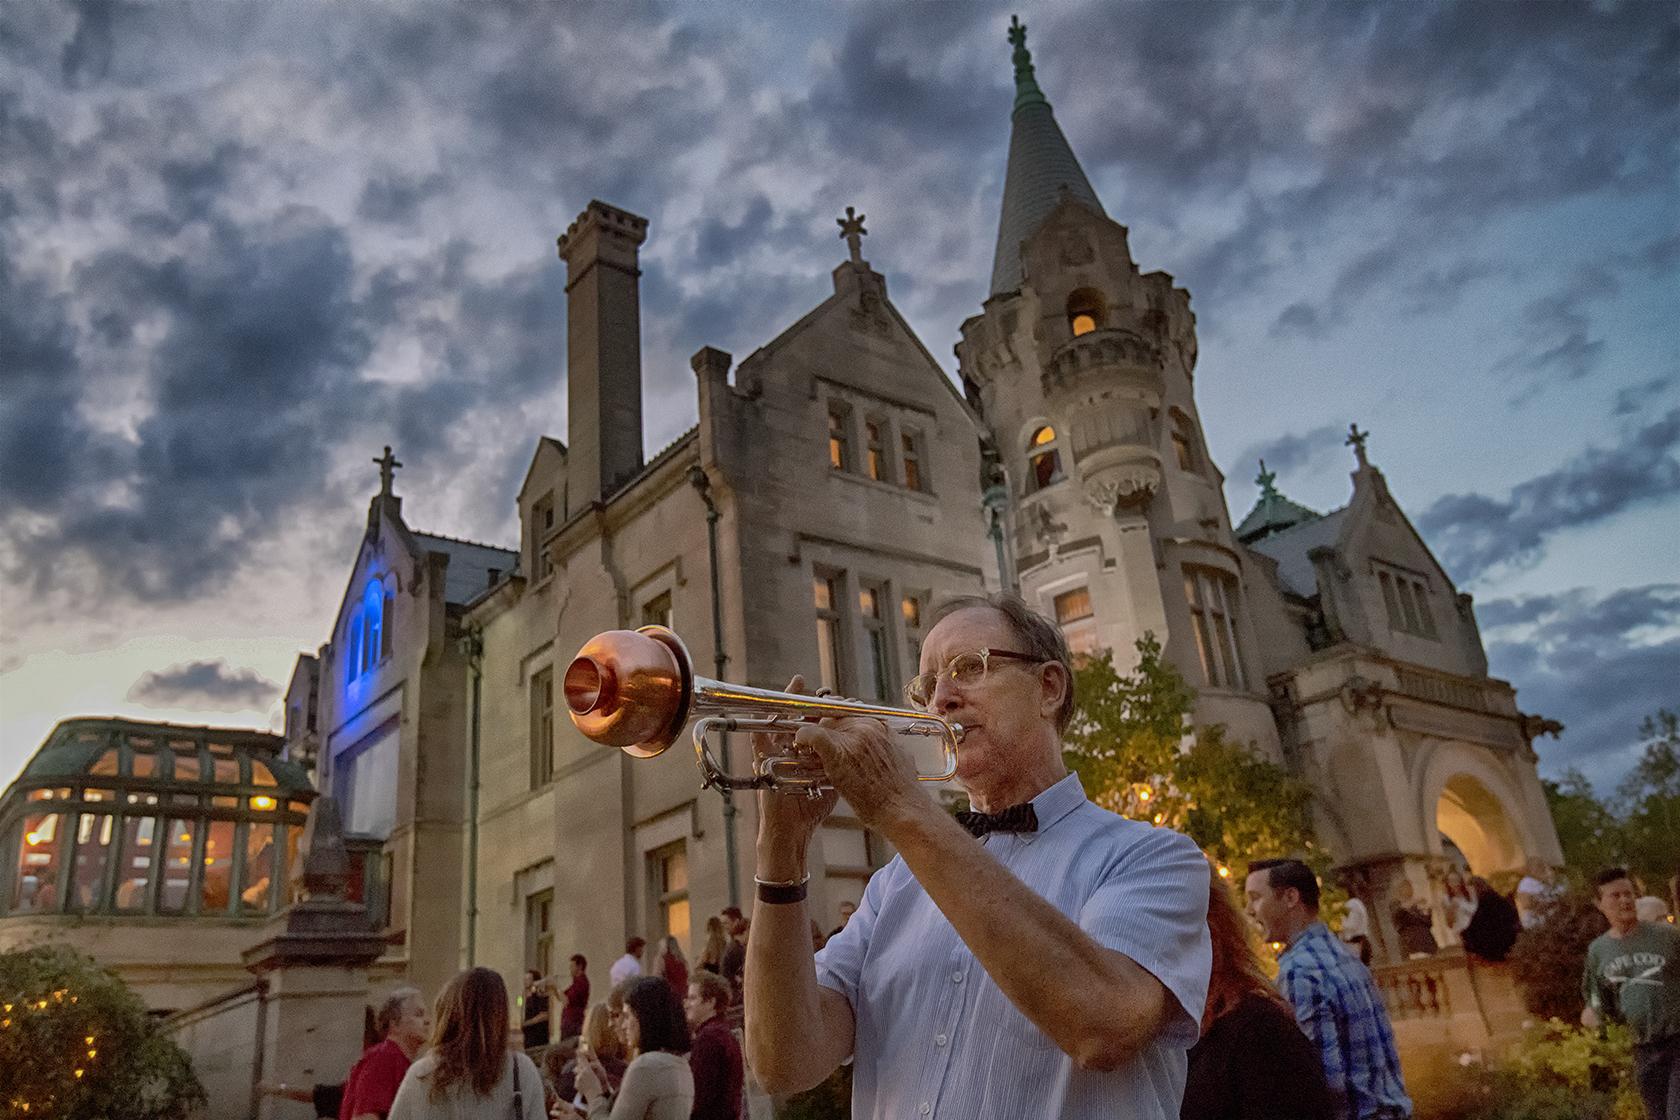 Trumpet player 2 0863.jpg